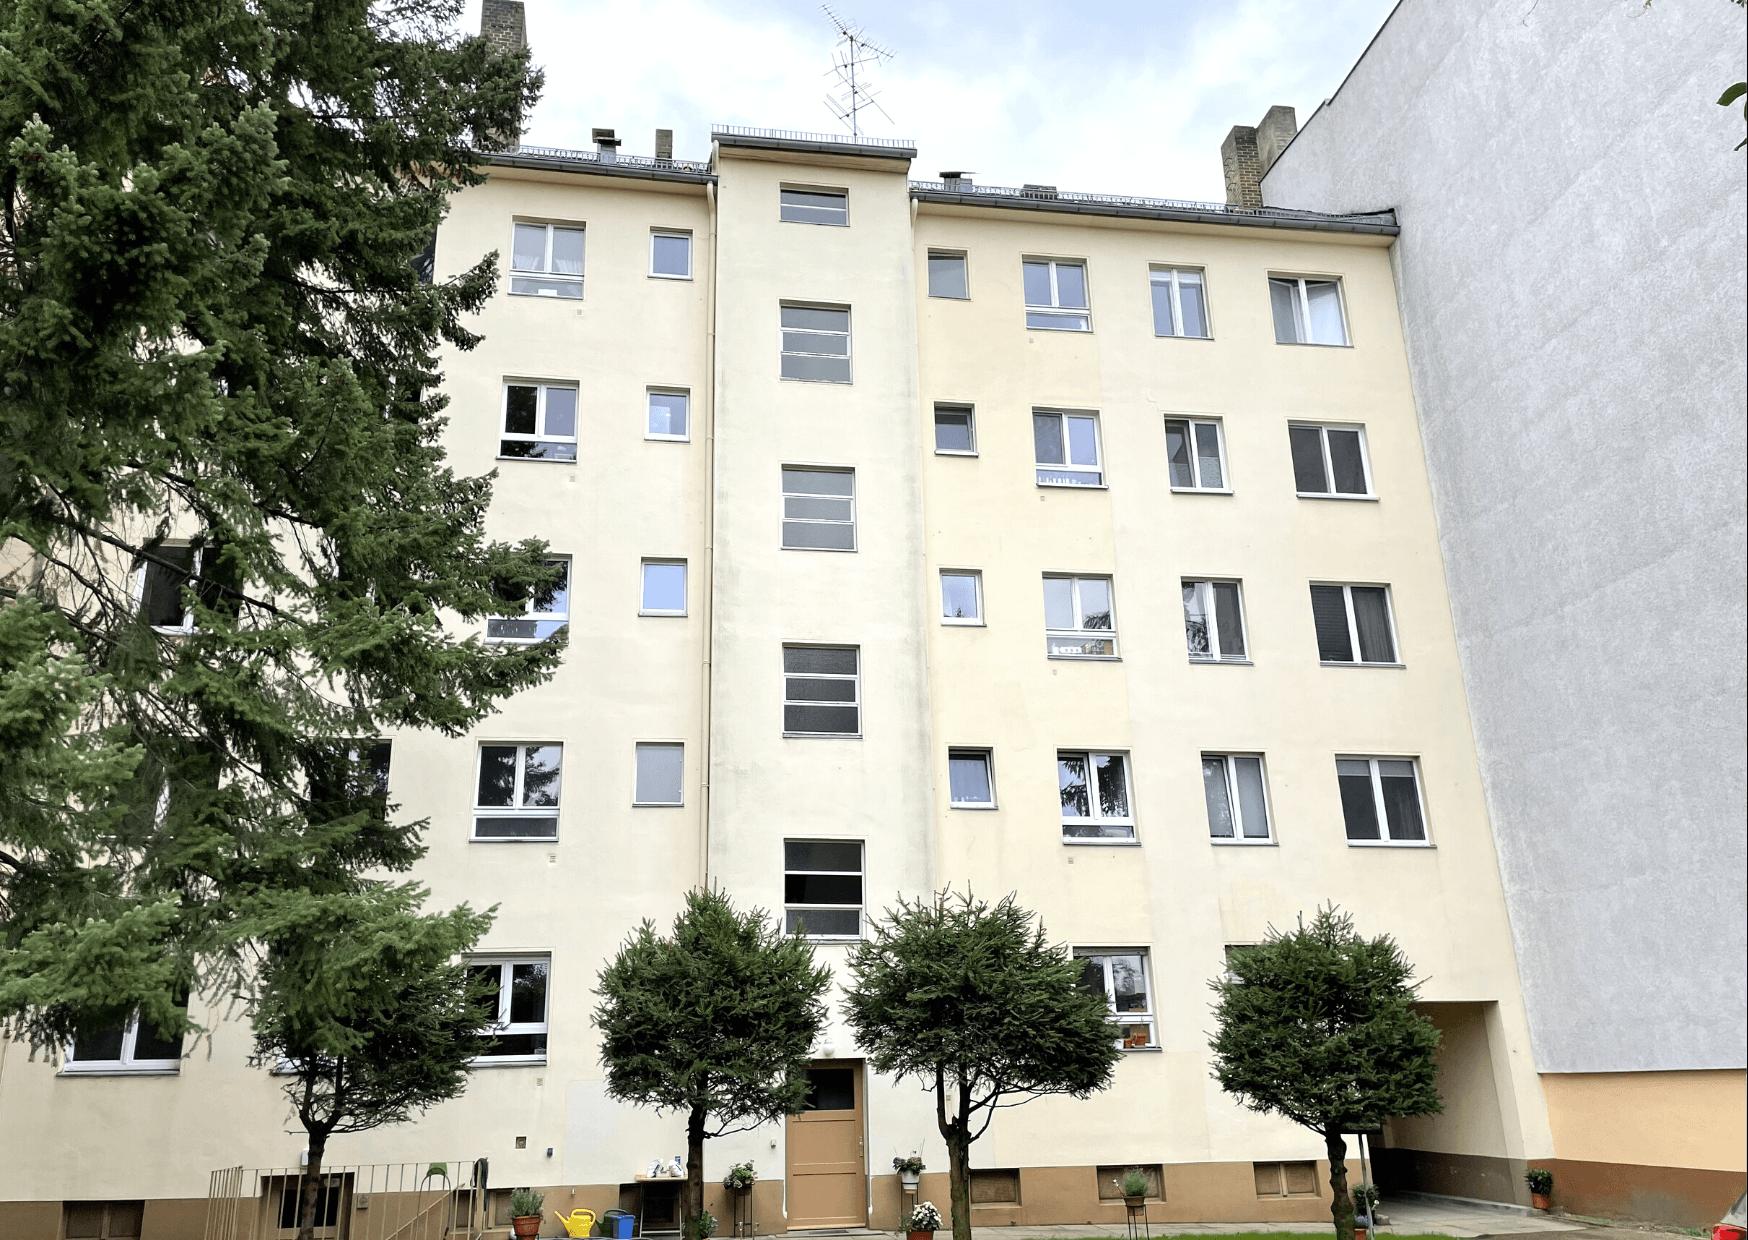 Mehrfamilienhaus Hausfassade in Friedenau Berlin.